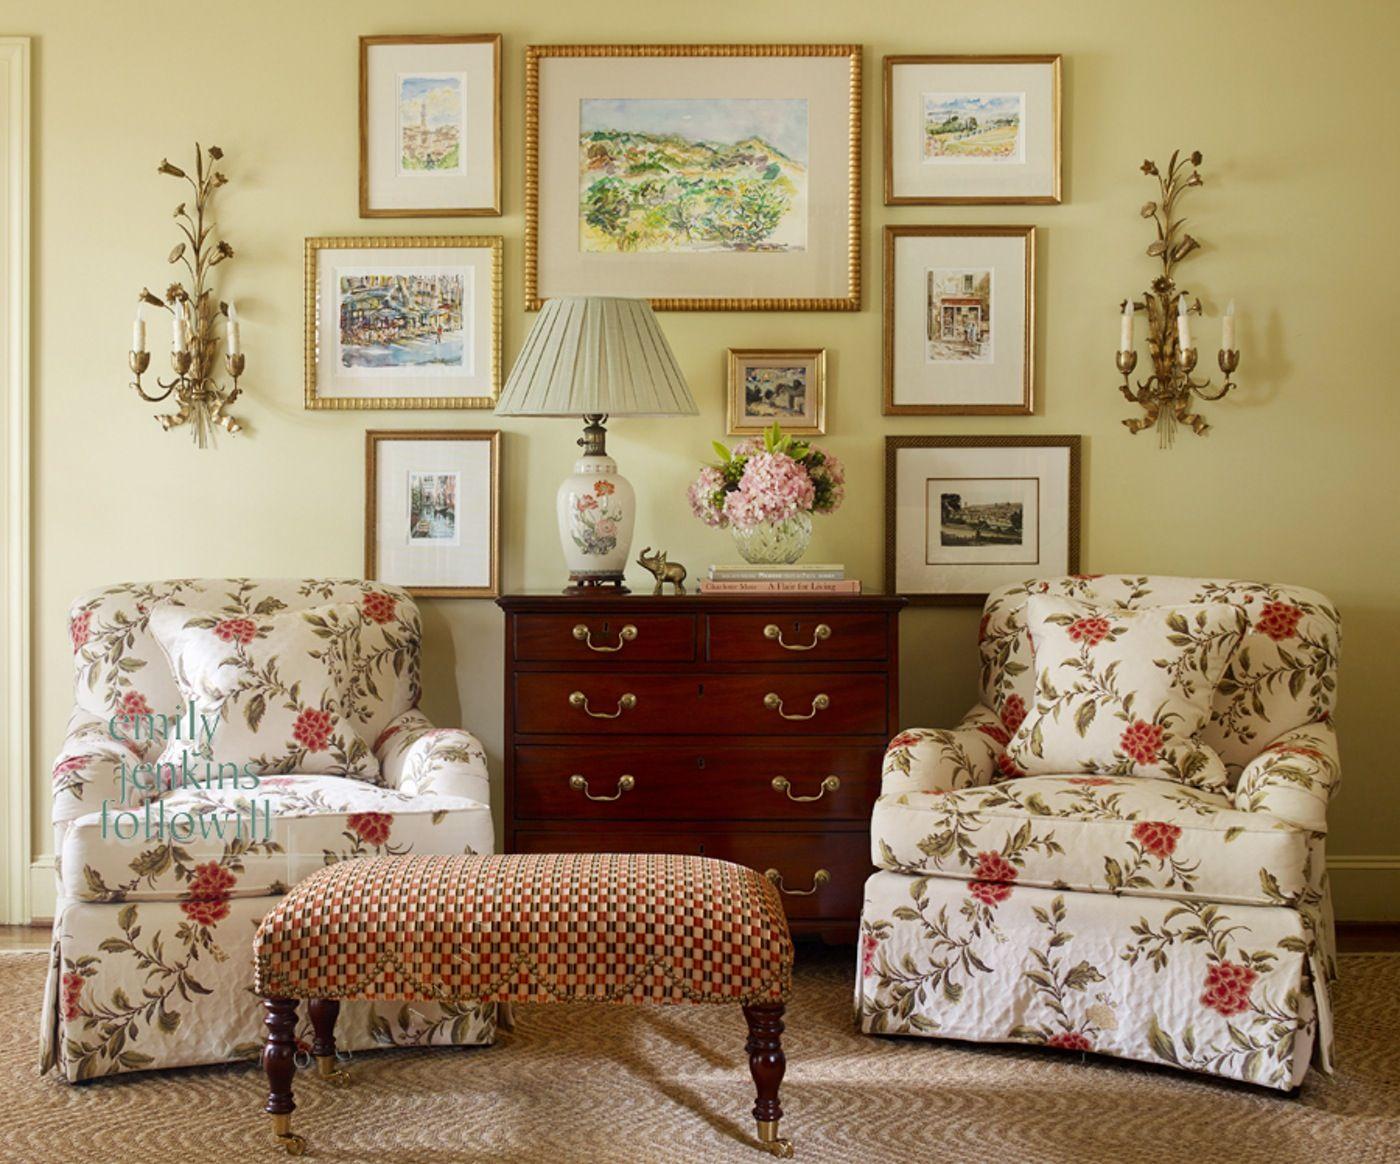 Catherine m austin interior design portfolio interiors styles.jpg?ixlib=rails 1.1